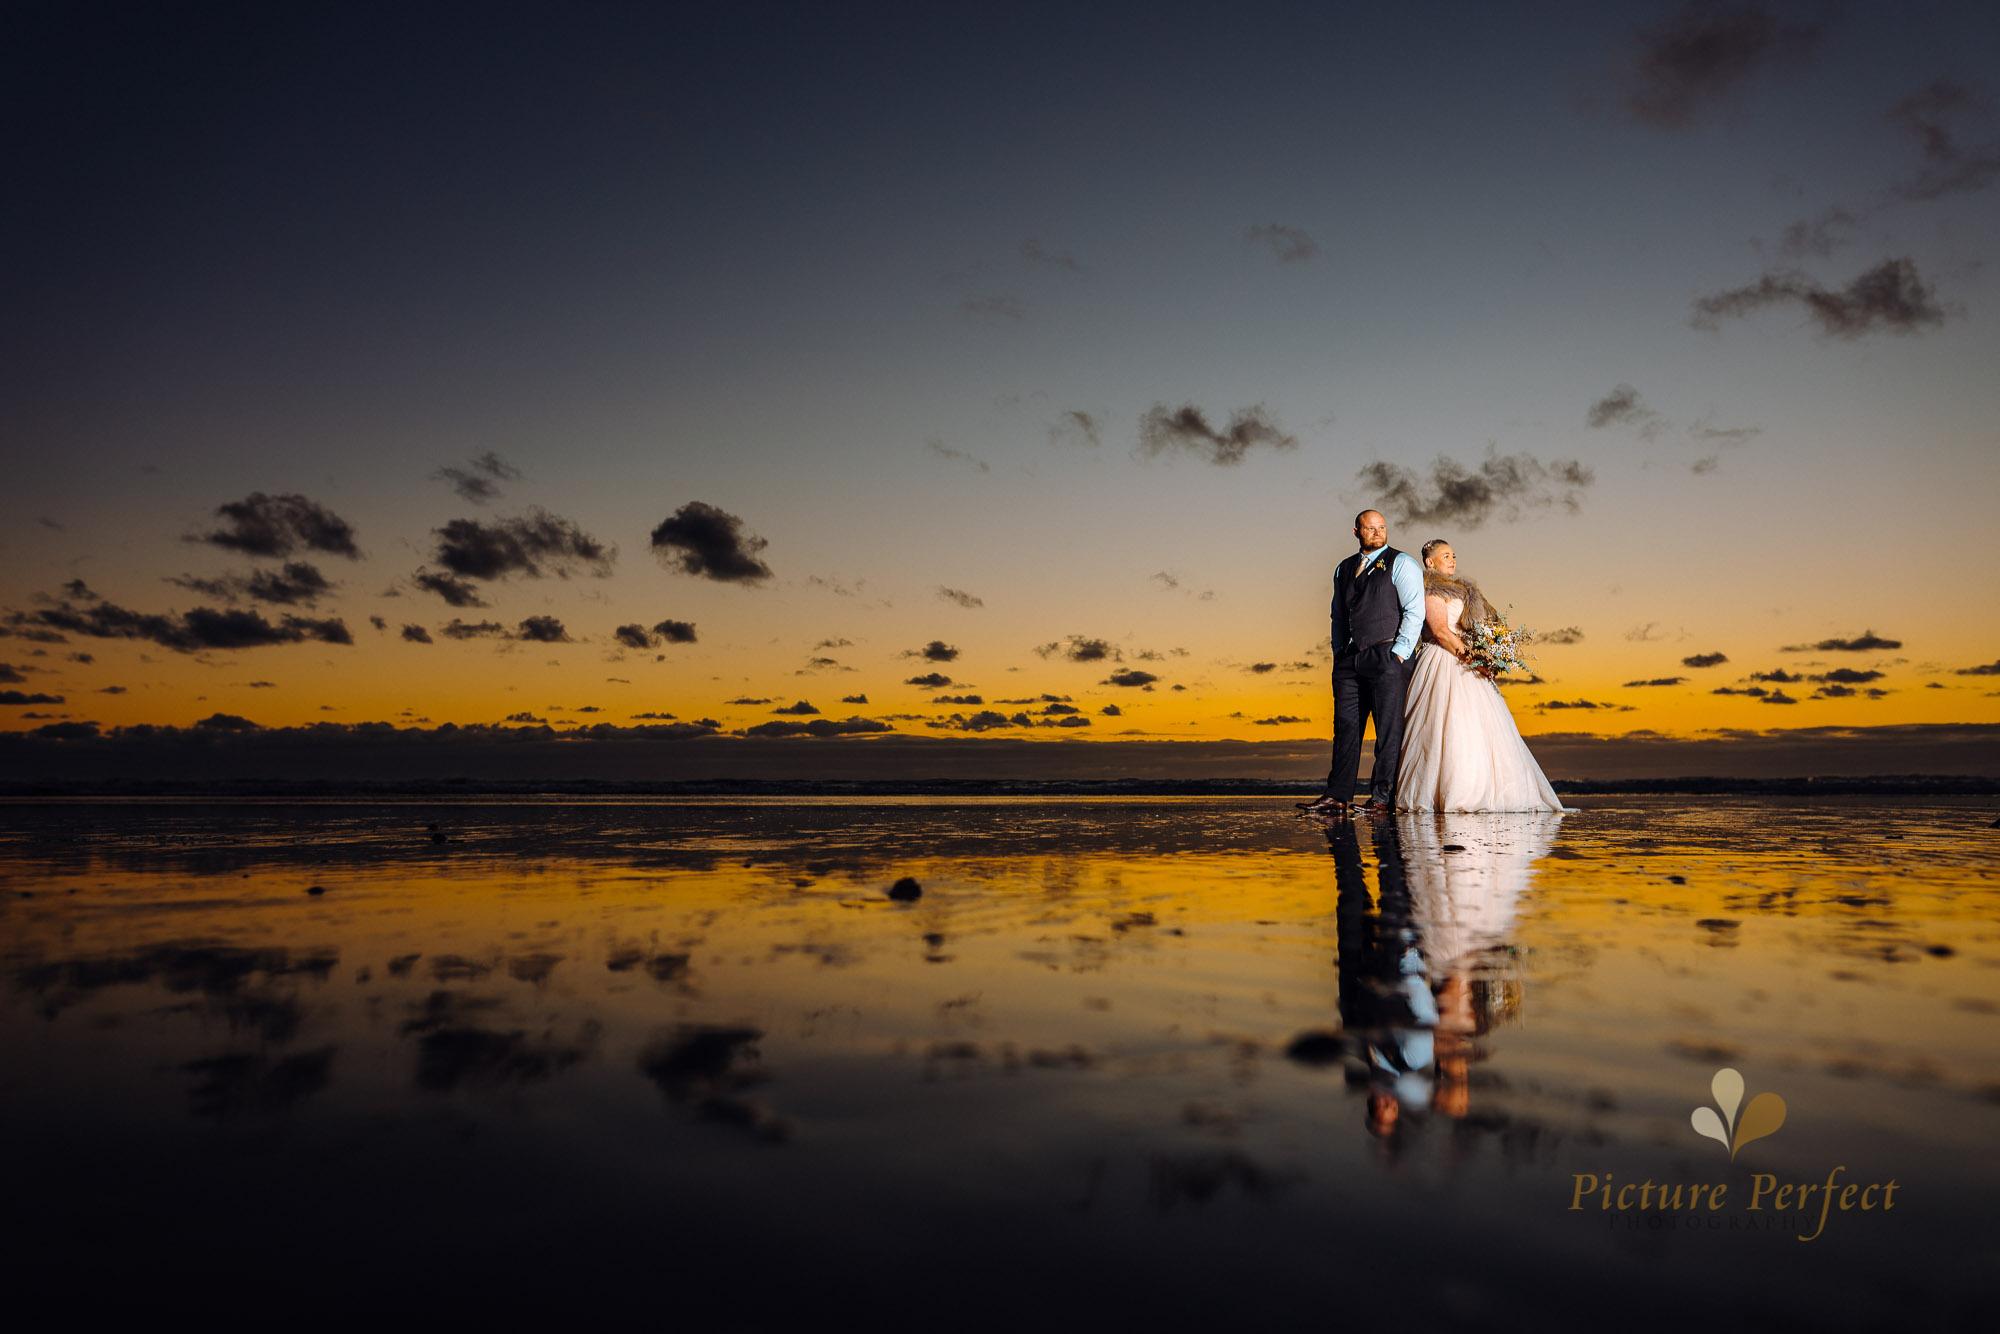 Manawatu beach bridal photography during golden hour with Tina 0058